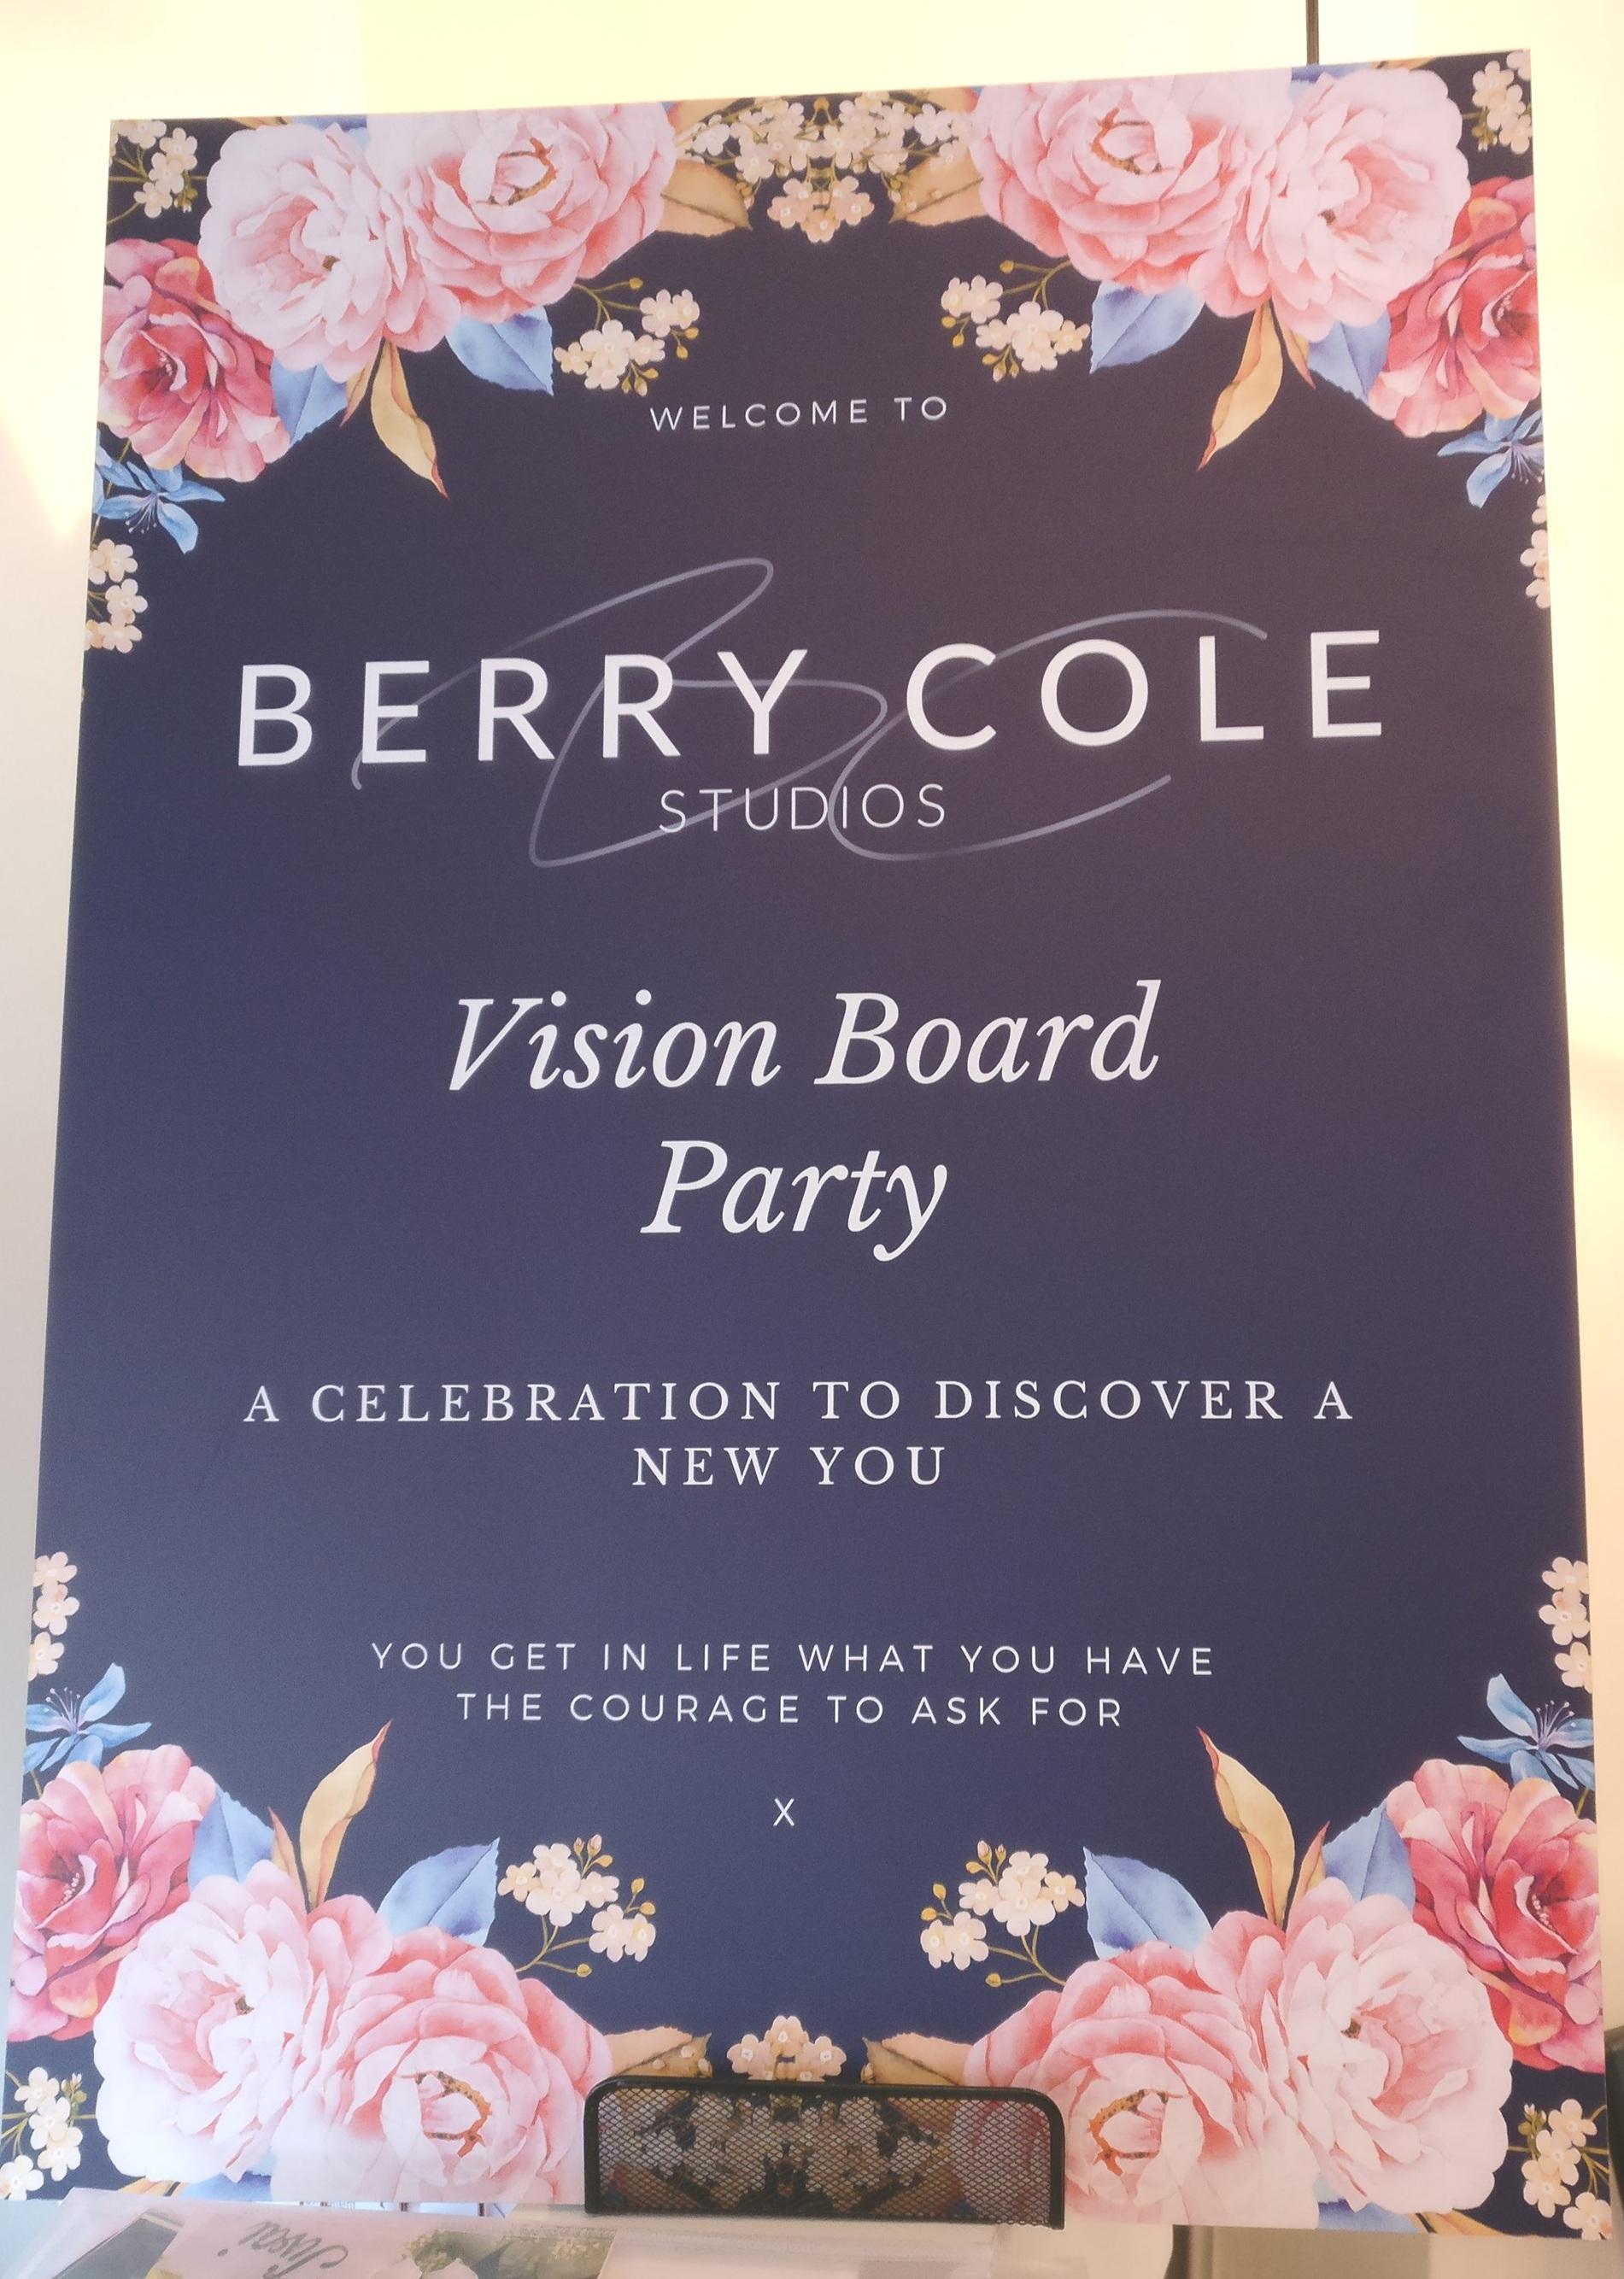 2019 - BerryCole Studios, London